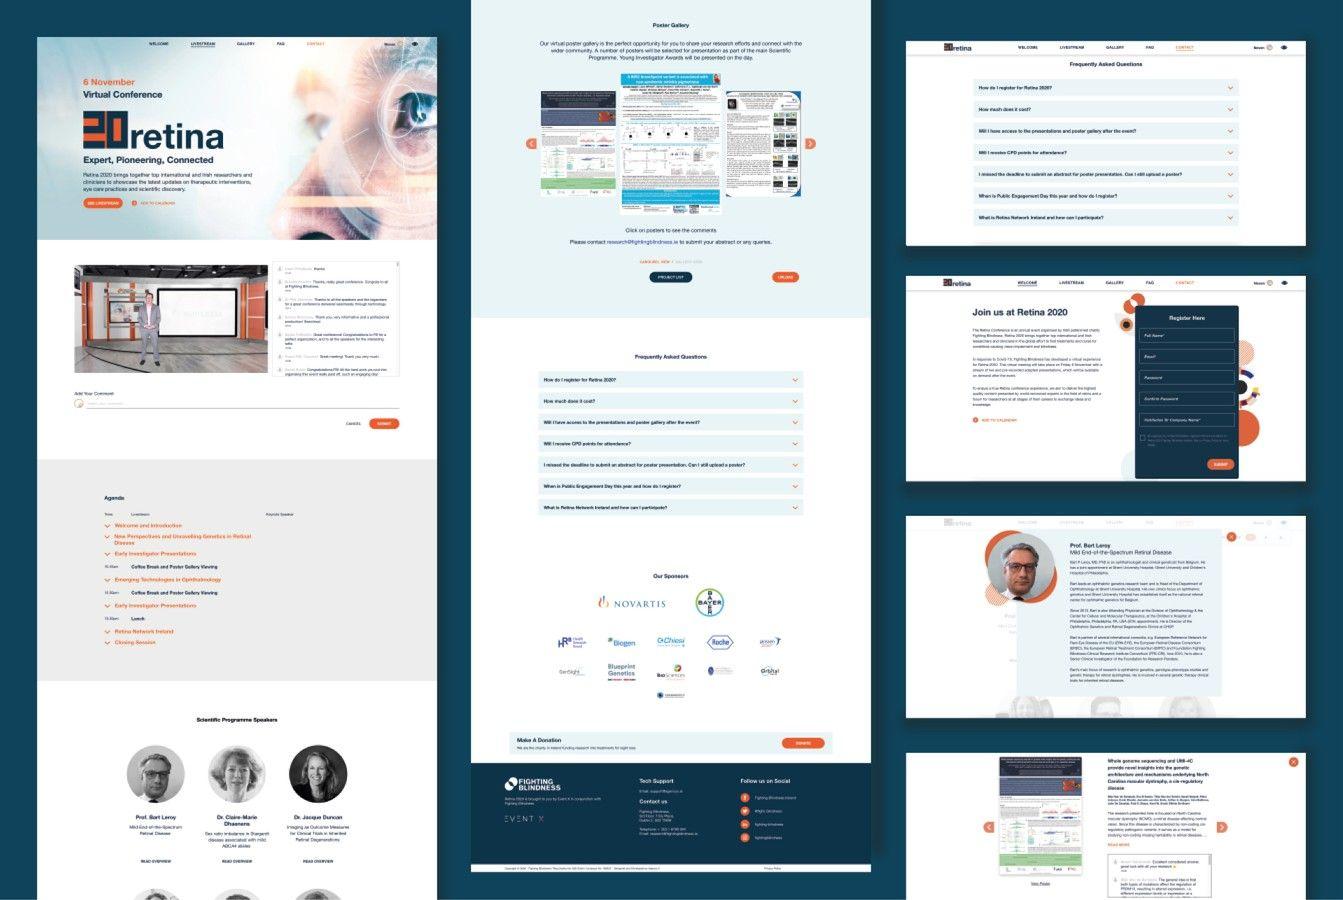 Fighting Blindness Website Design Retina 2020